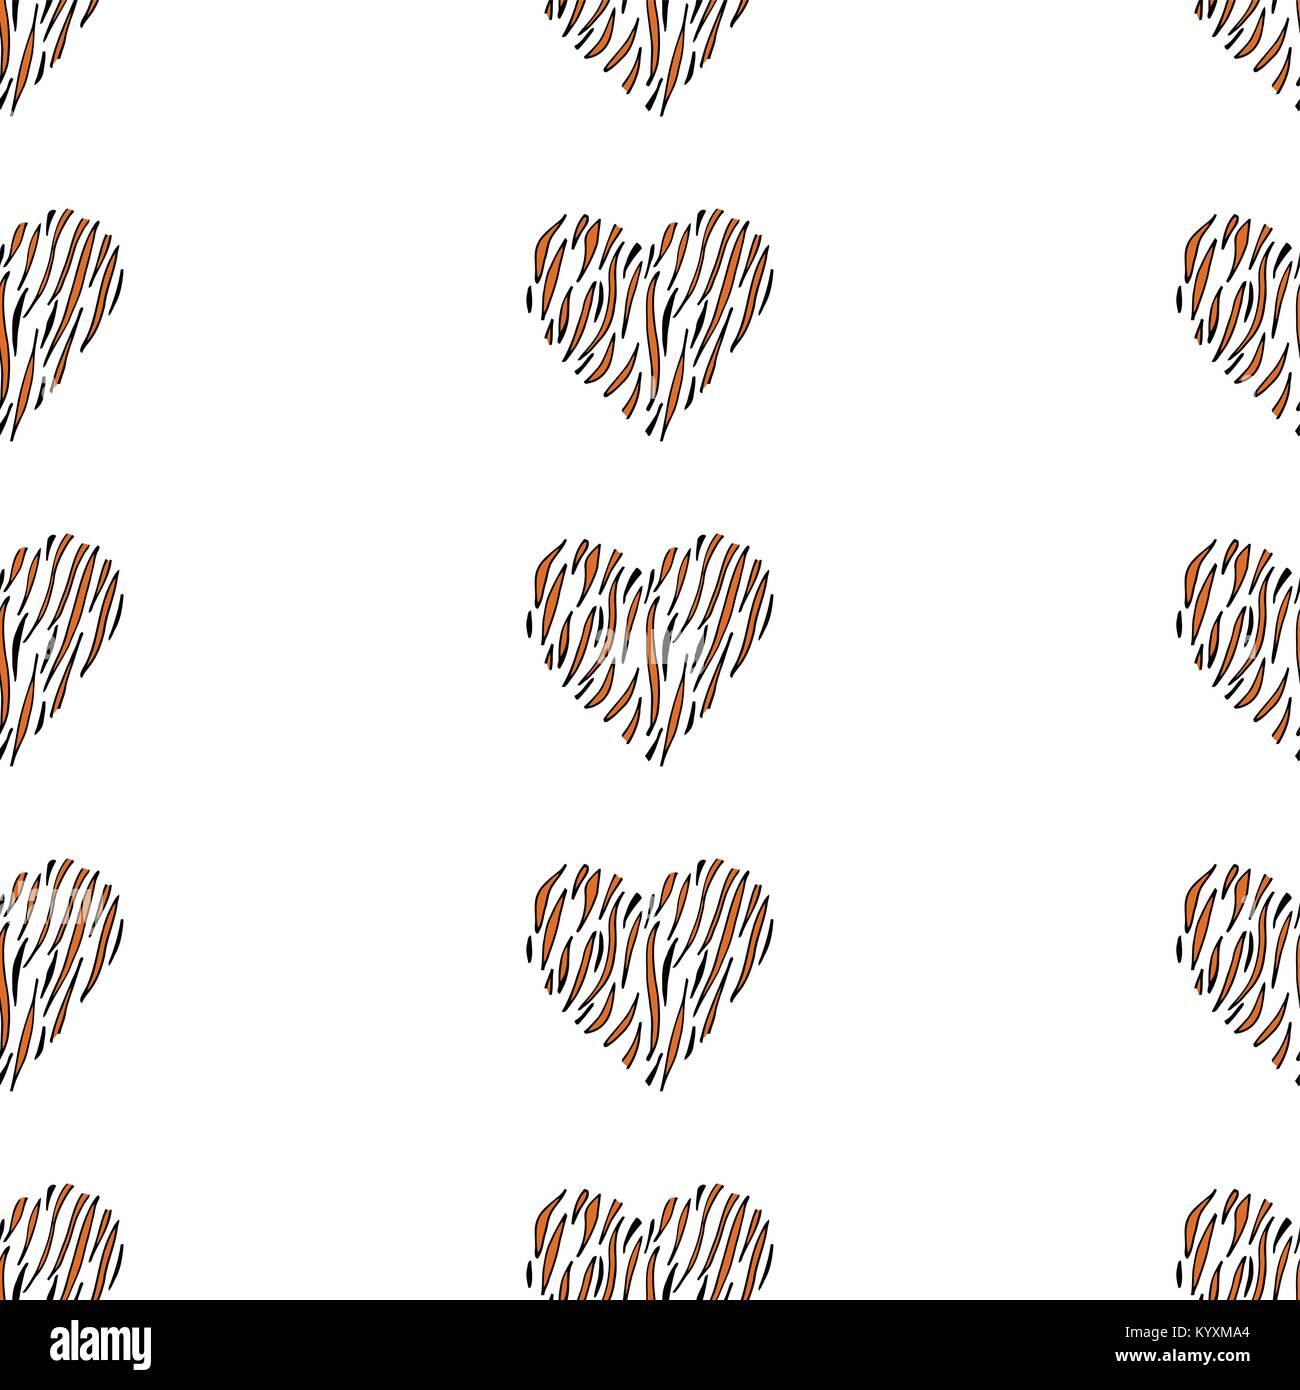 Seamless pattern background heart. - Stock Image